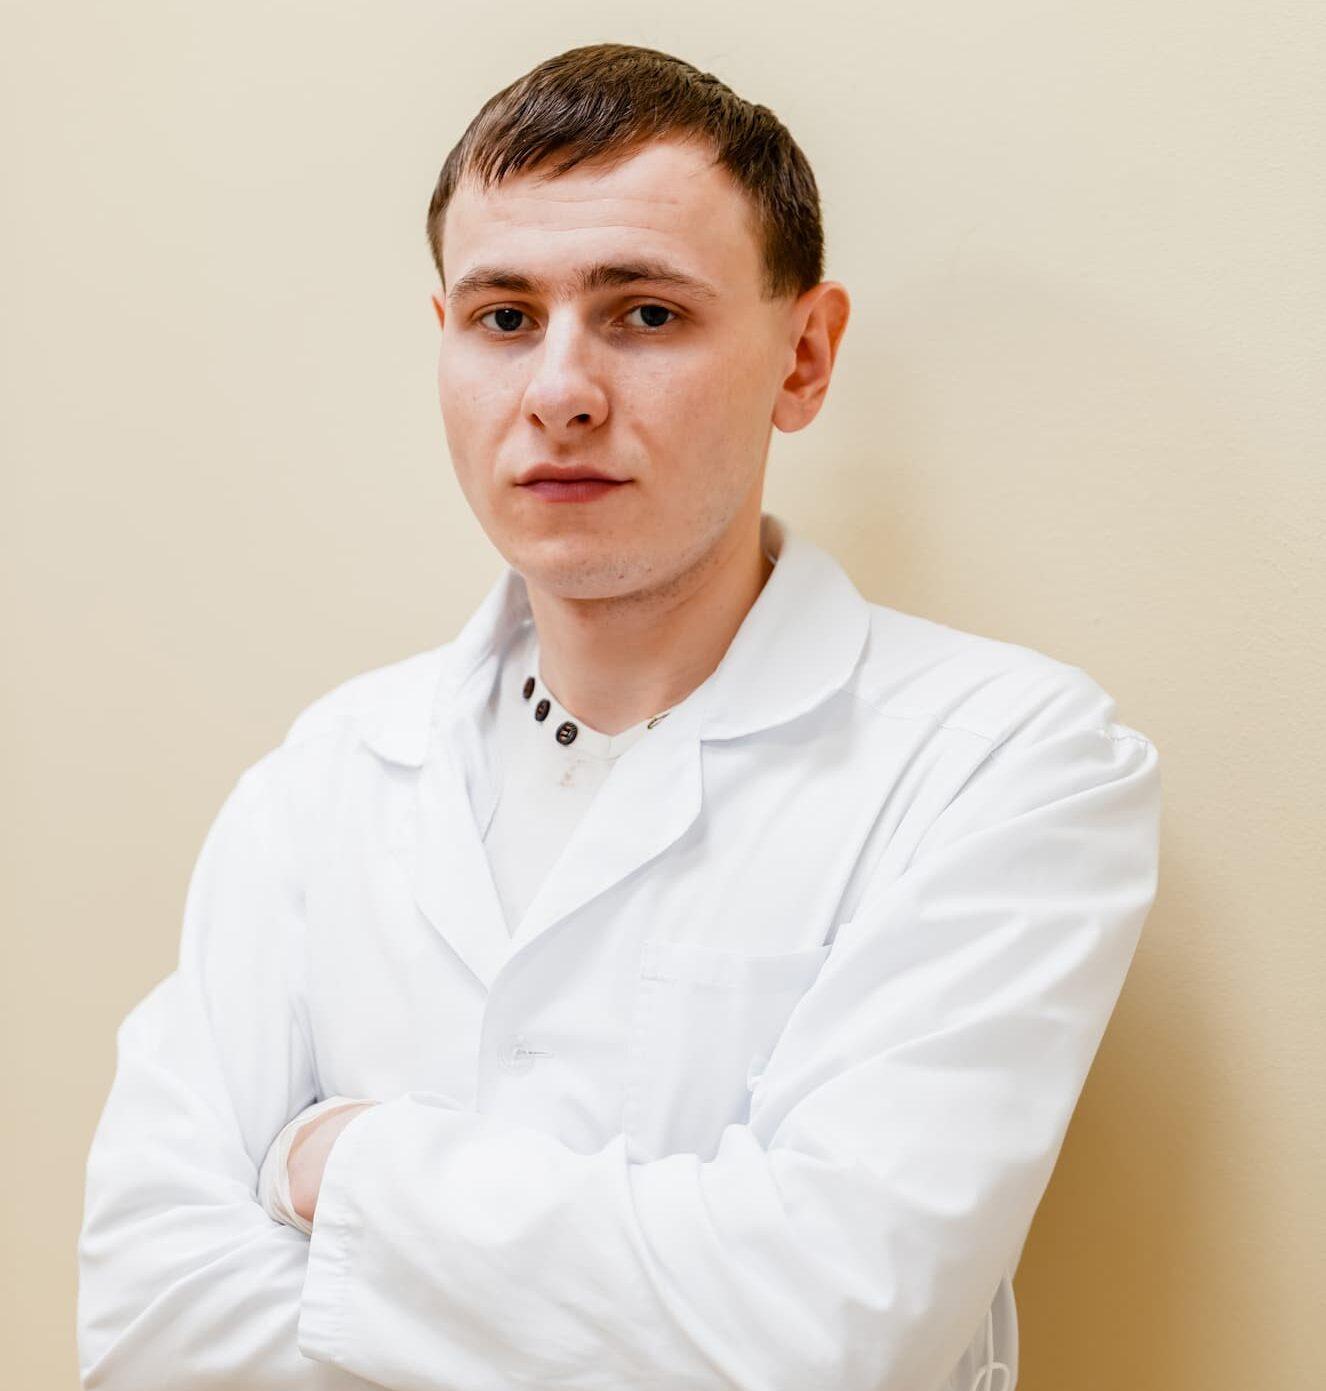 https://reutov.mrt-diomag.ru/wp-content/uploads/2021/03/atrohov-e1616529822828.jpeg